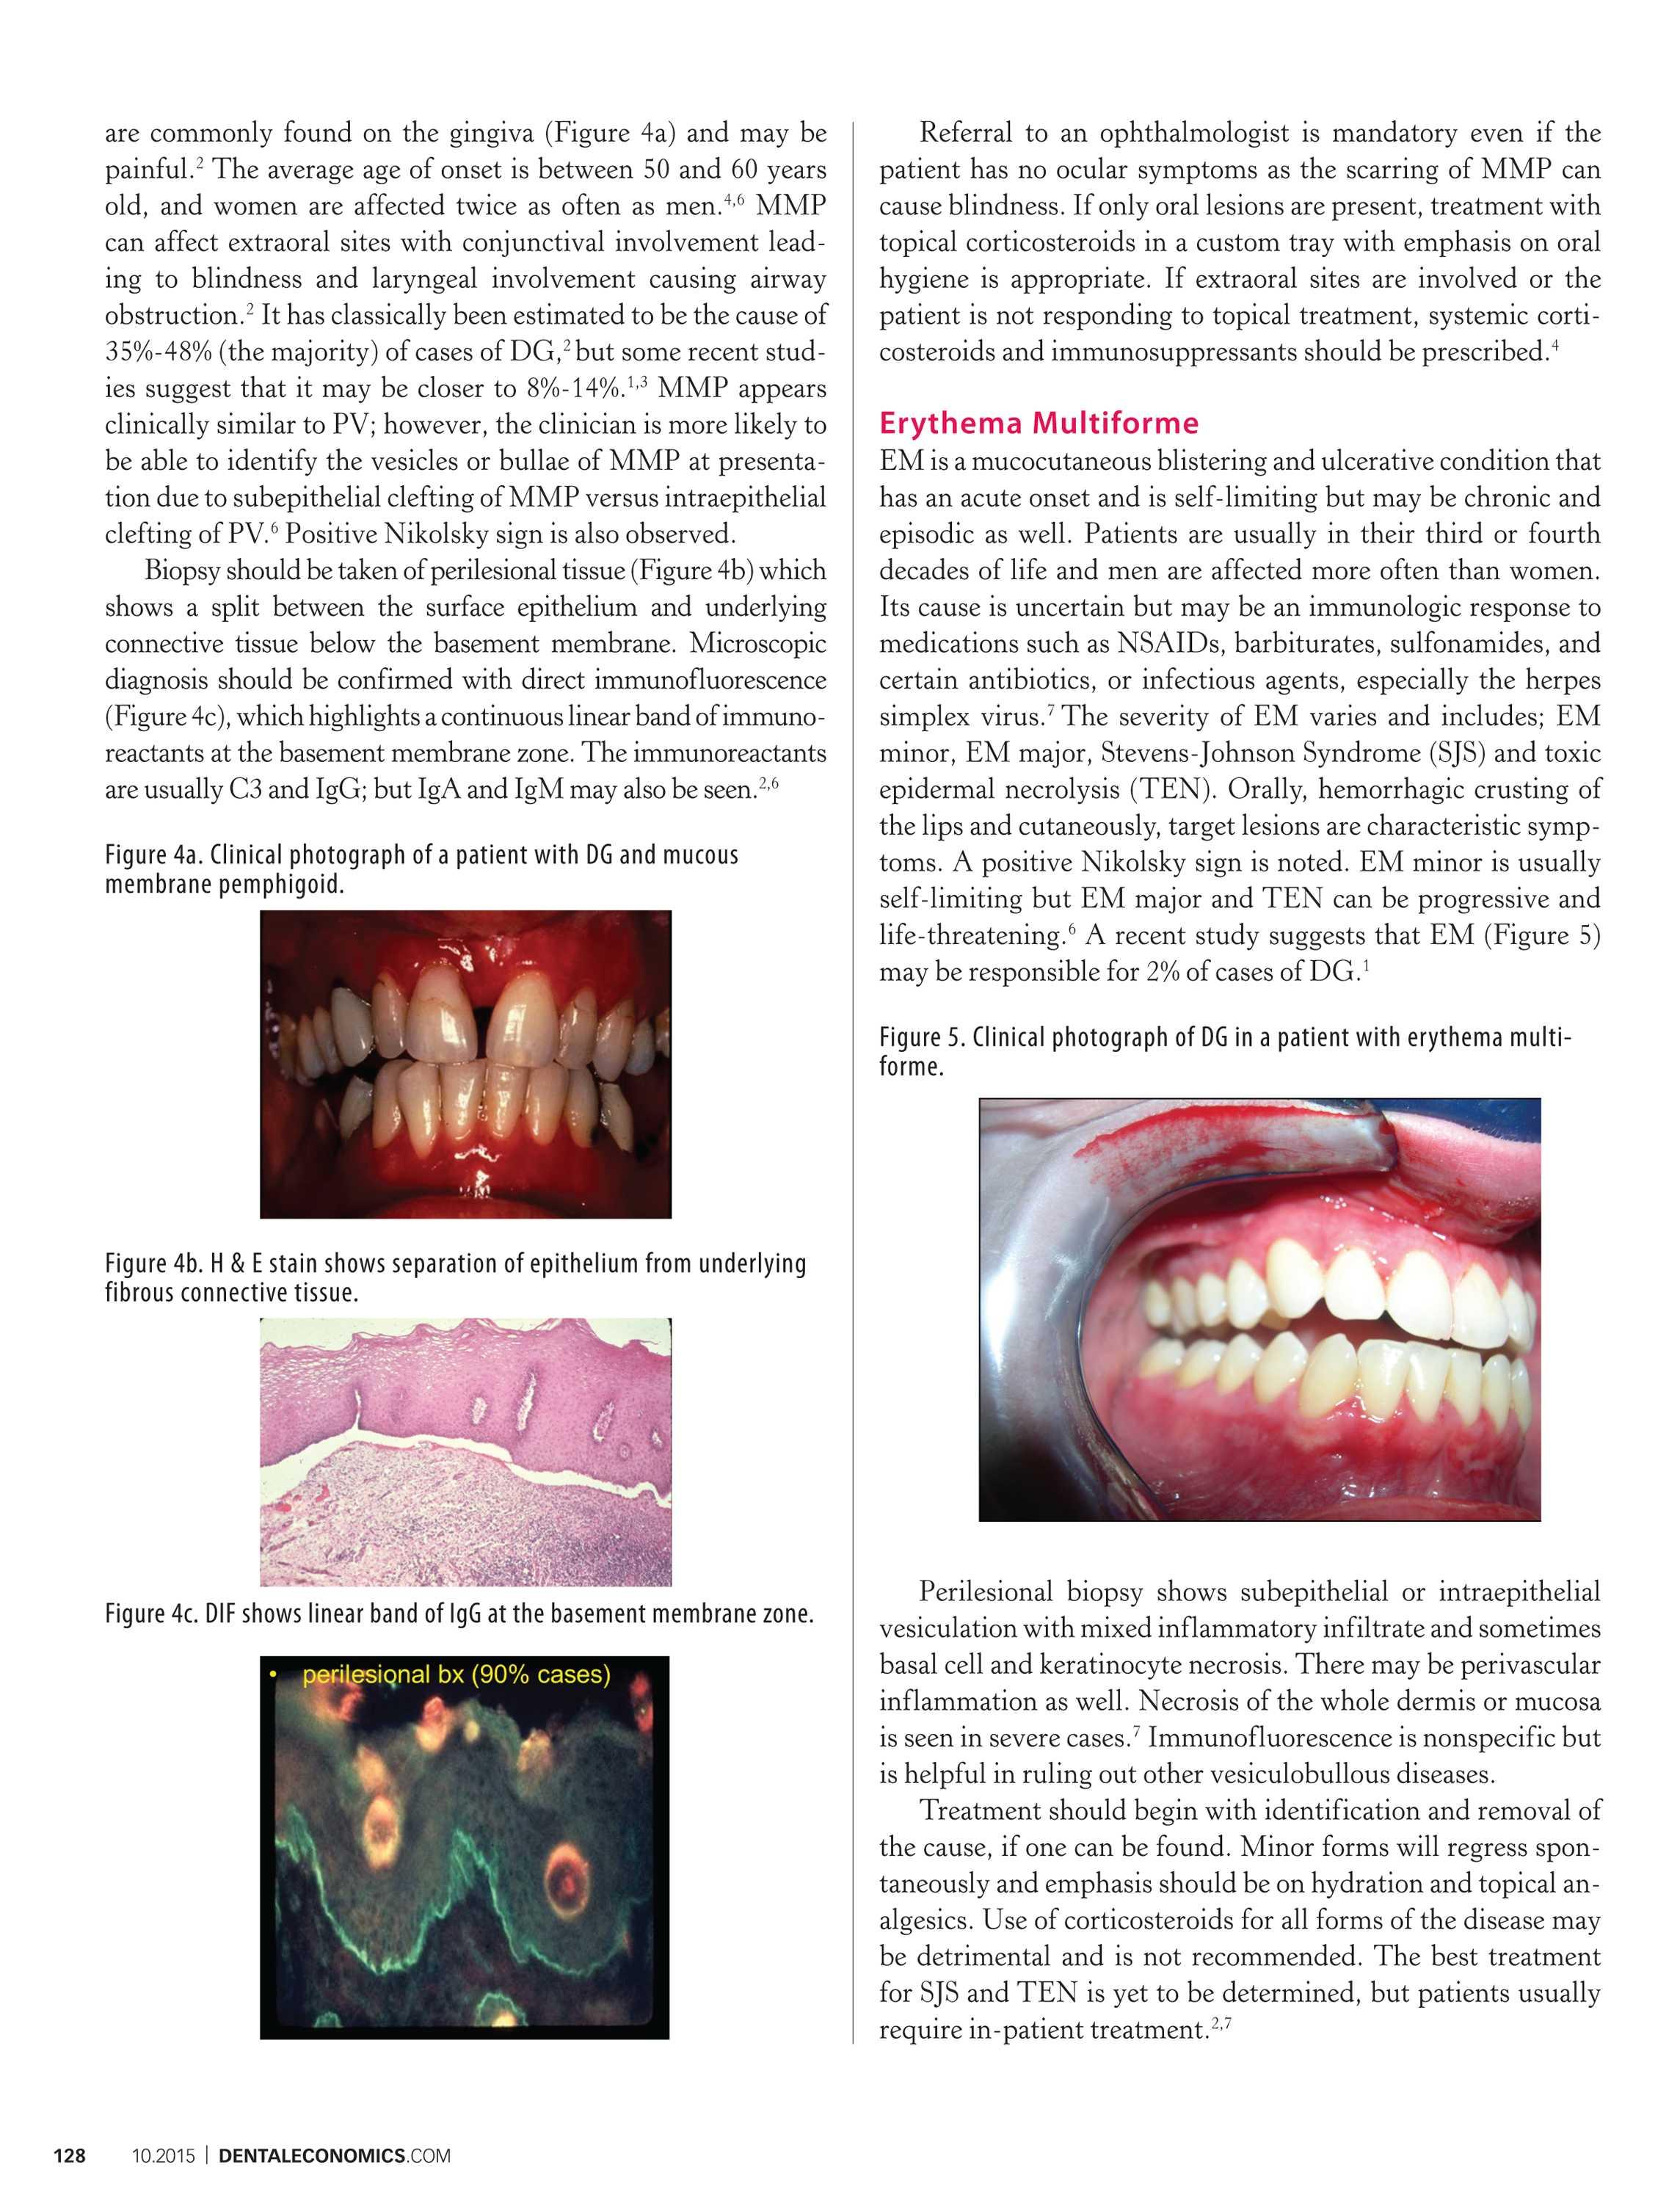 Dental Economics - October 2015 - page 128